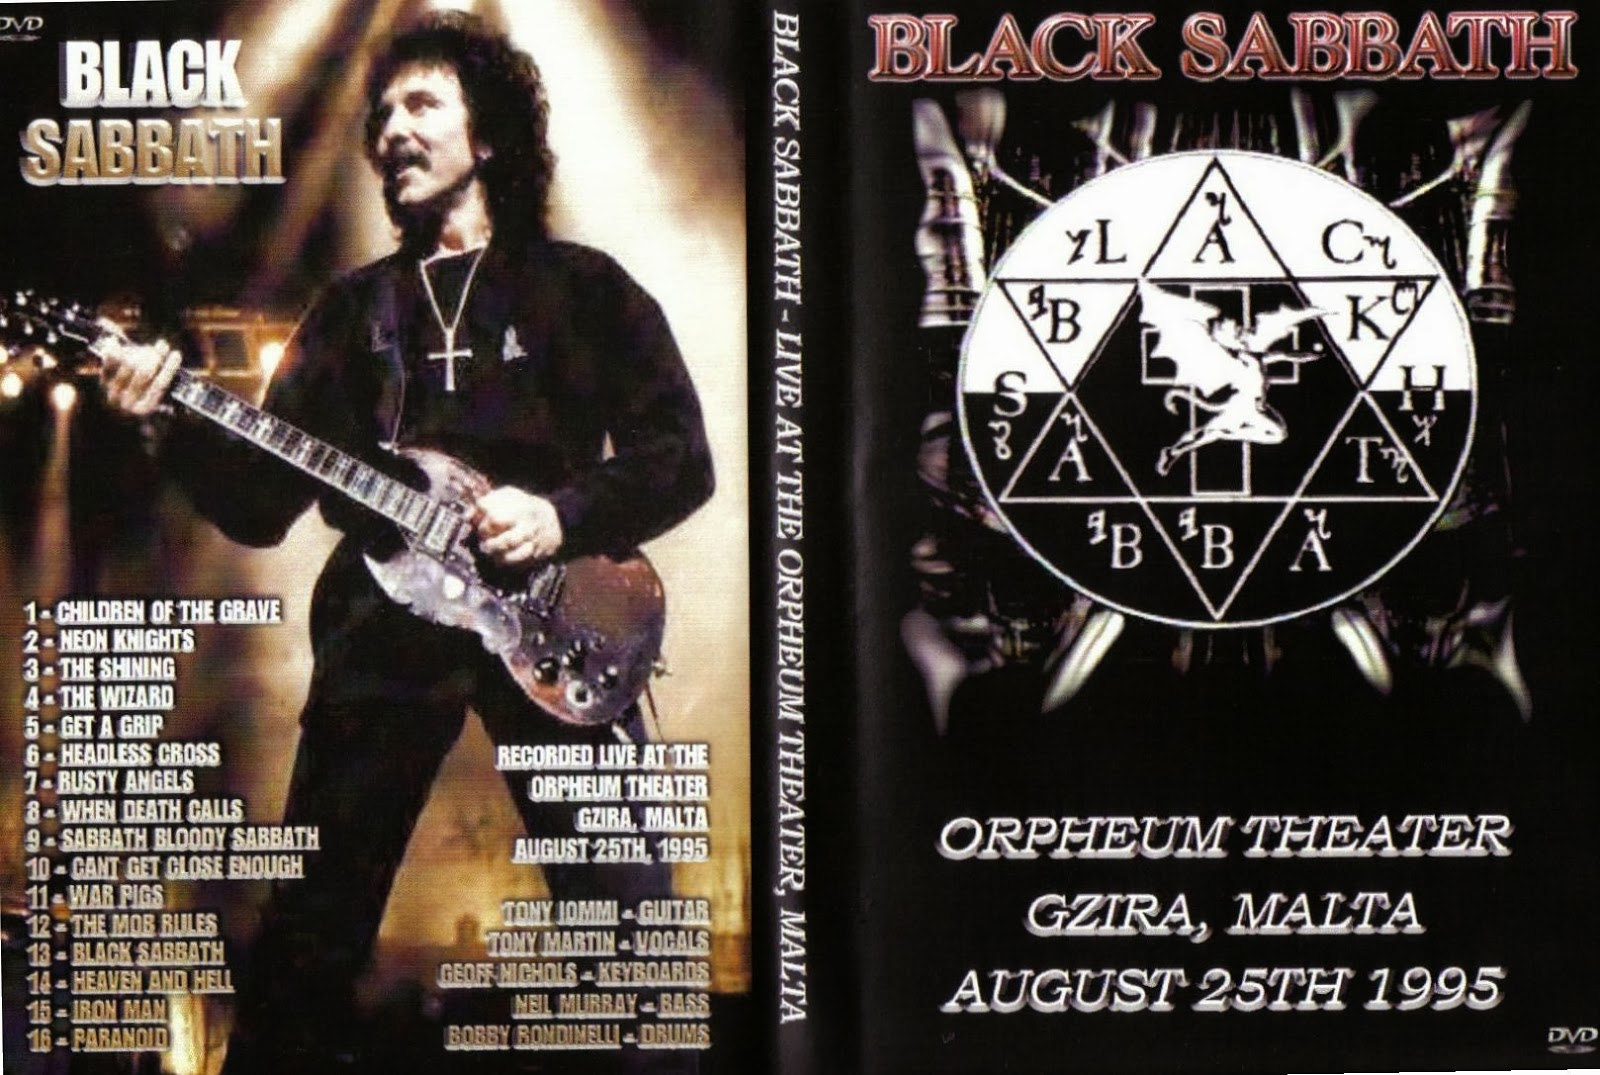 T U B E Black Sabbath 1995 08 25 Gzira Malta